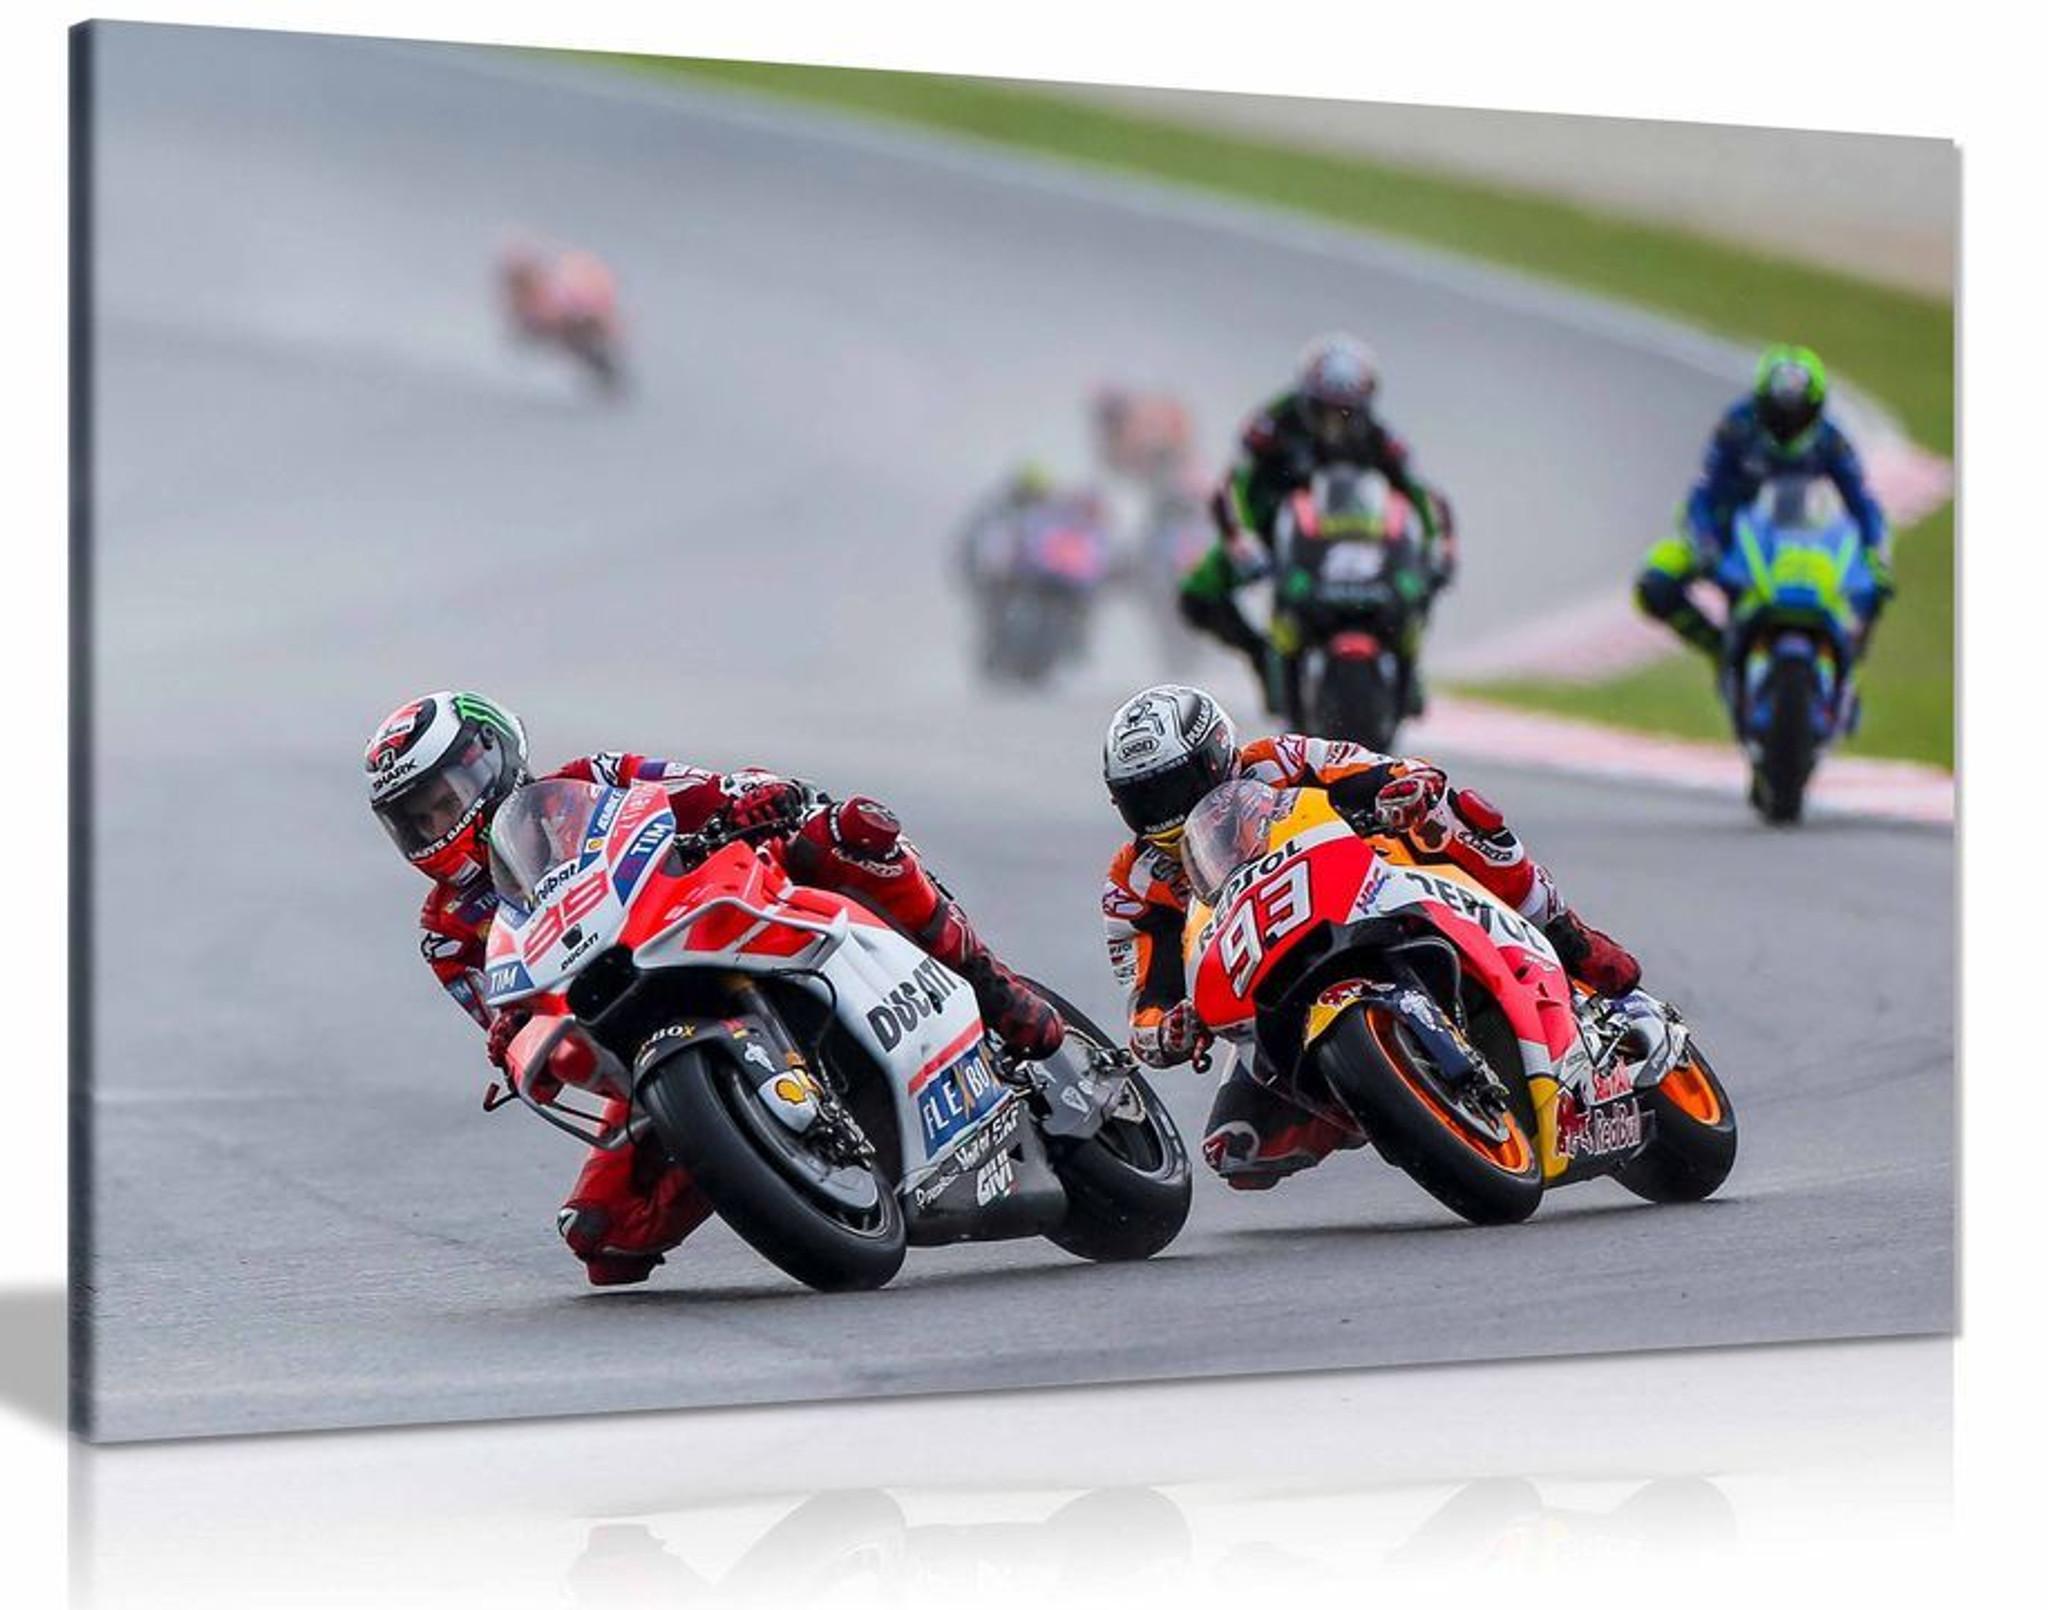 Jorge Lorenzo & Marc Marquez Moto GP Canvas Wall Art Picture Print Home Decor